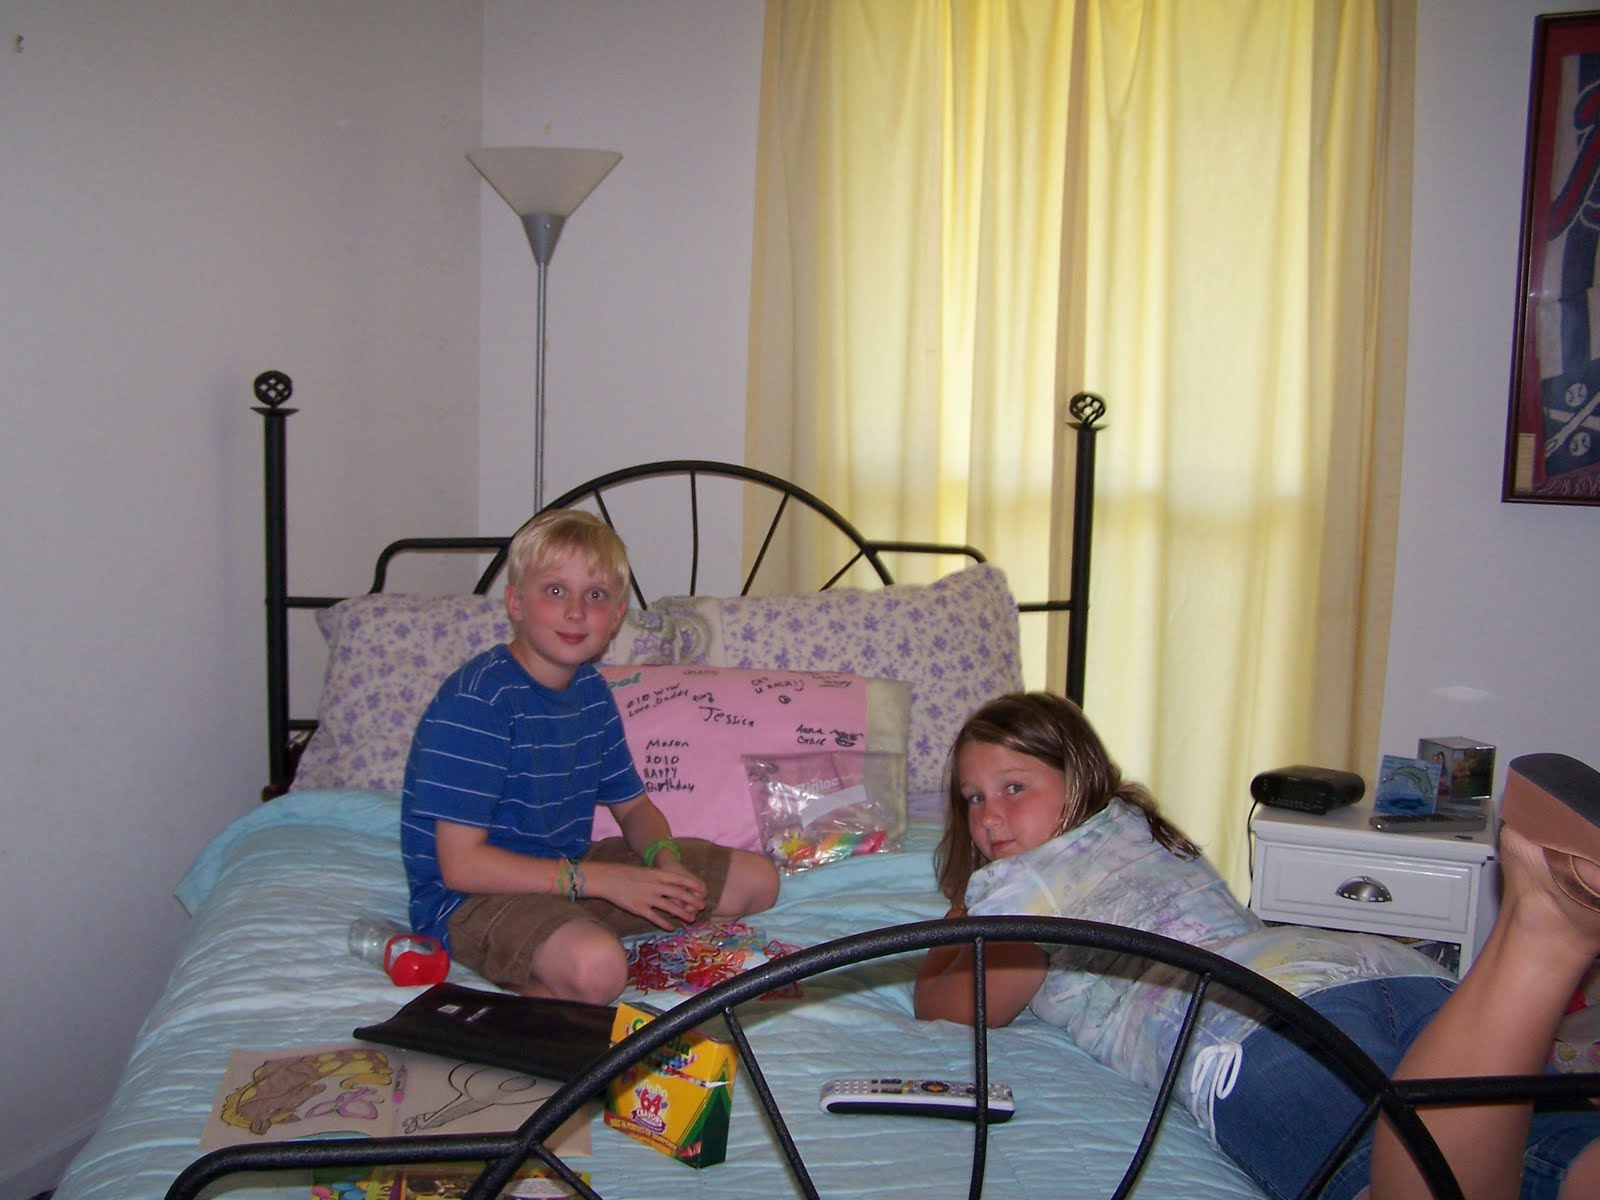 http://4.bp.blogspot.com/_v5QJFQDS_uY/TDlHVoI2FRI/AAAAAAAABwM/Y3judRgAlWQ/s1600/judd+riley+bed.jpg